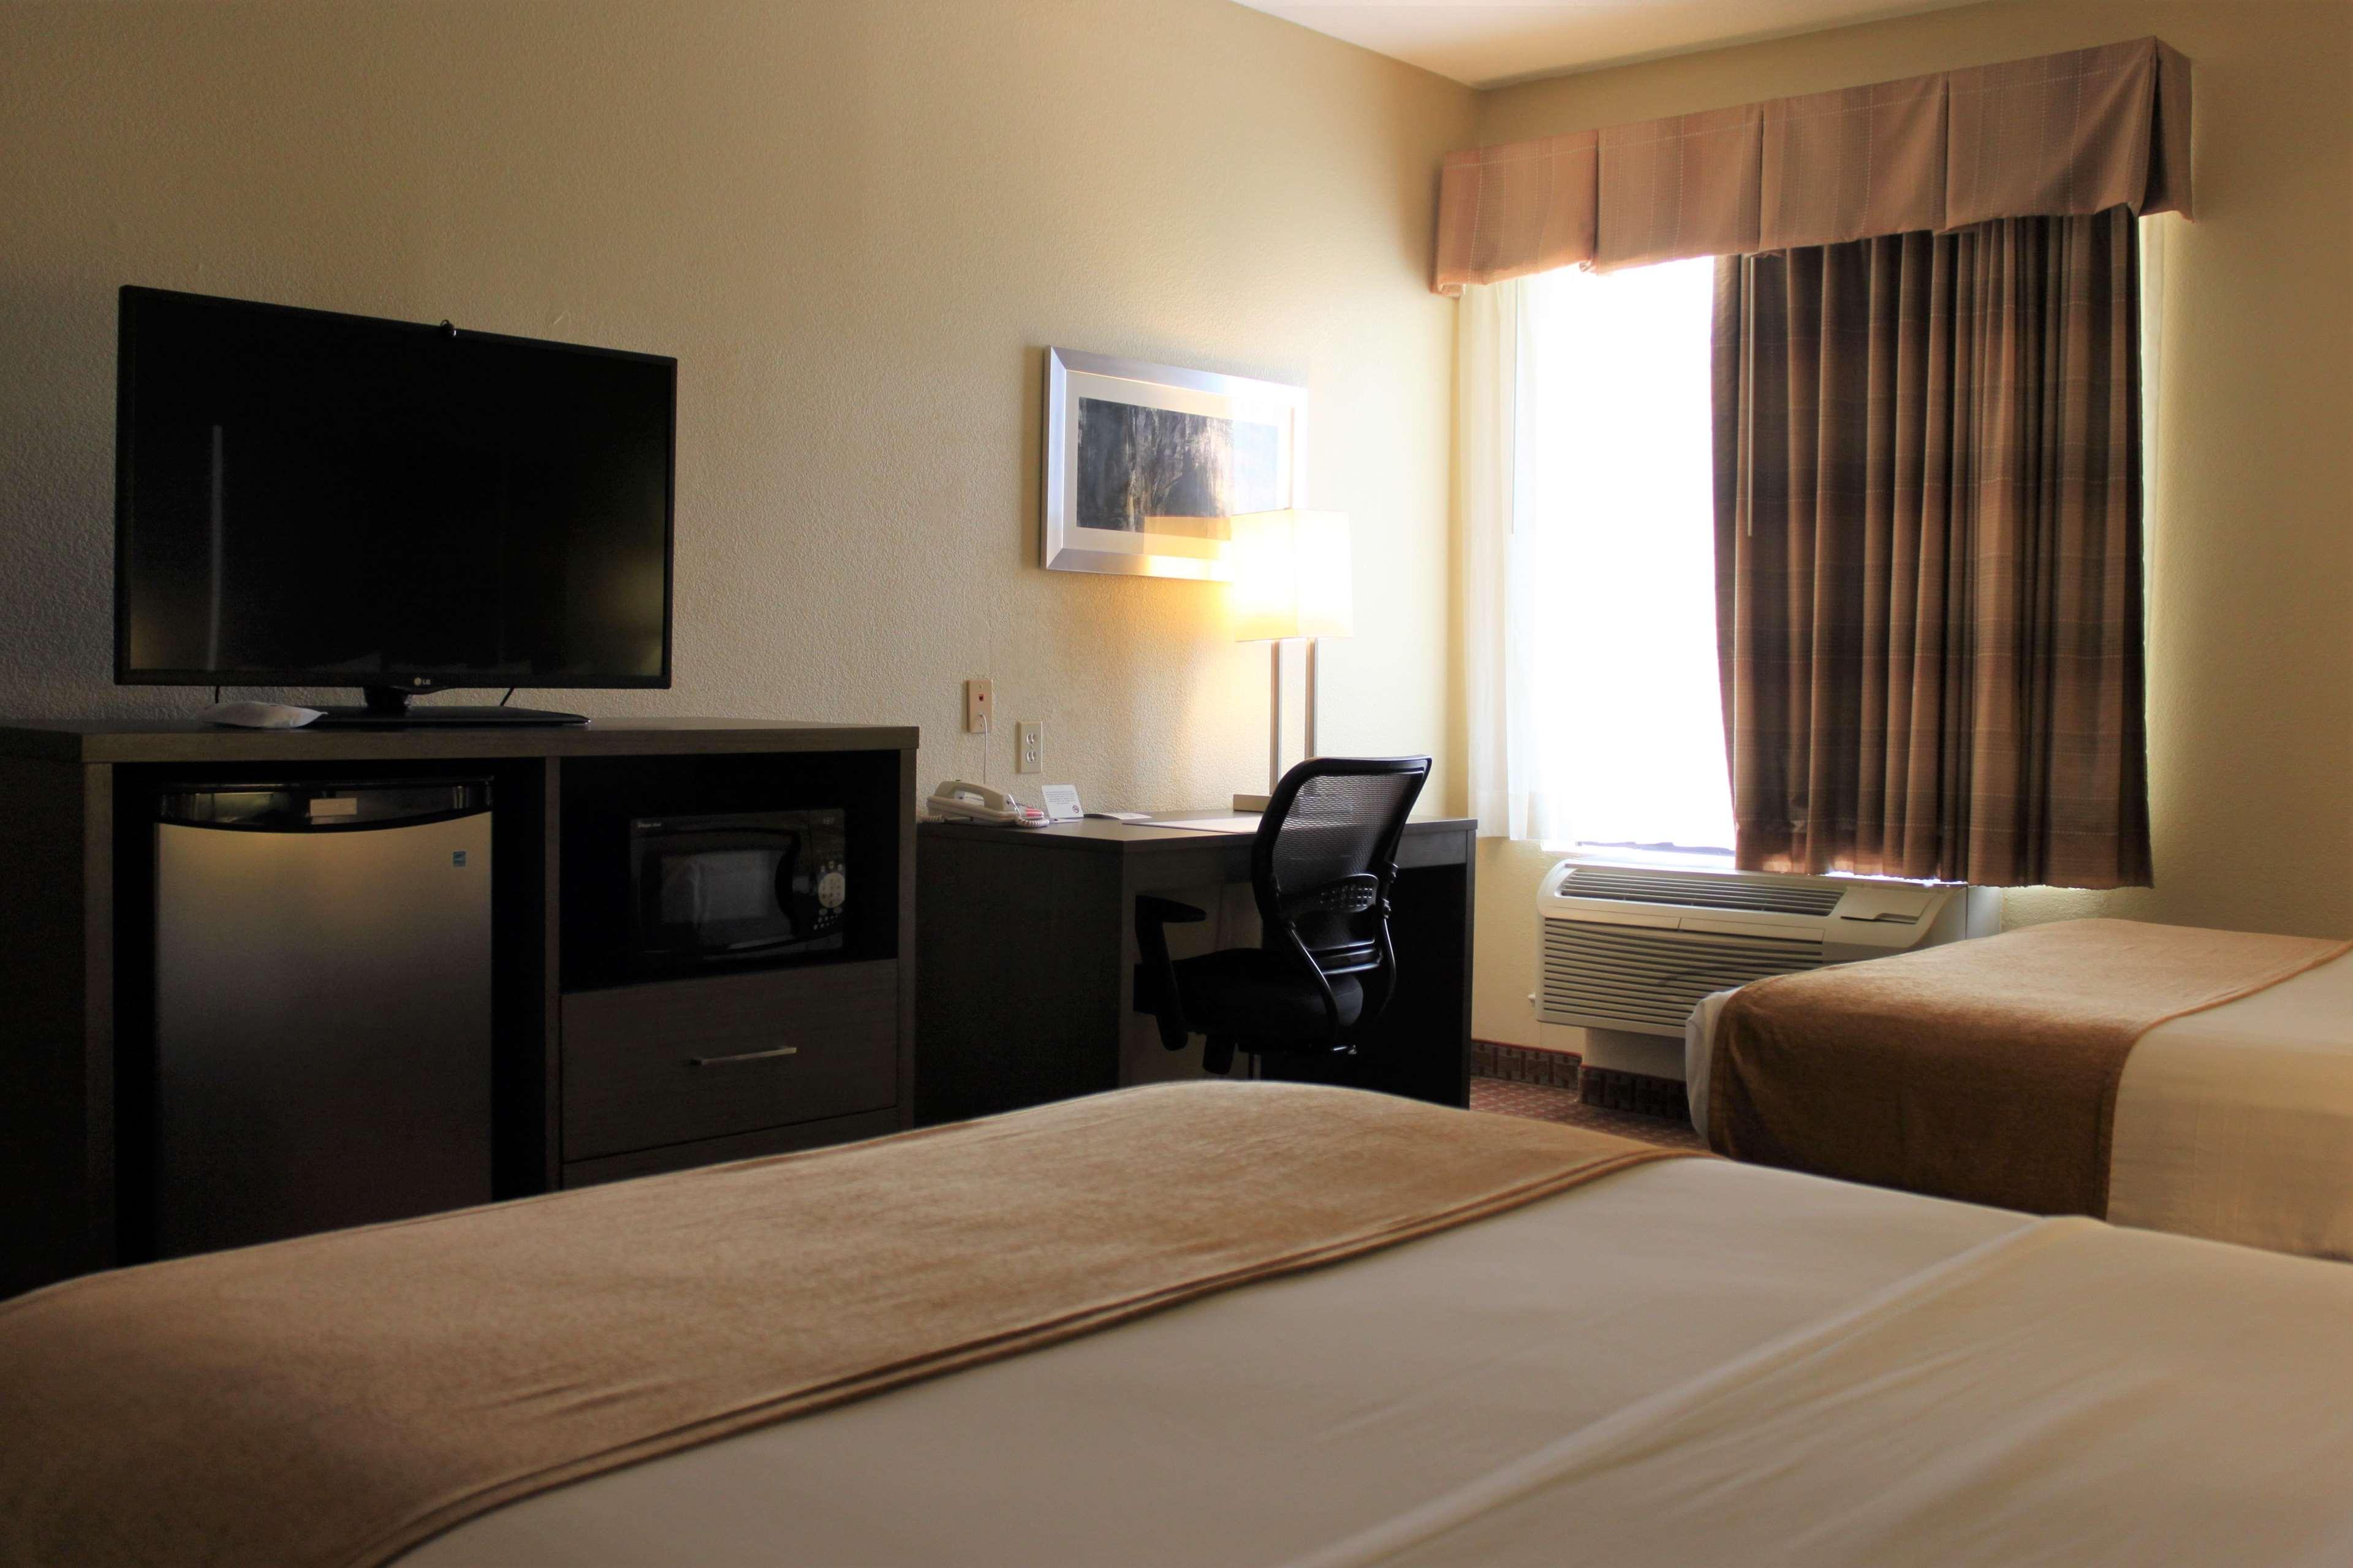 Best Western Plus North Houston Inn & Suites image 25